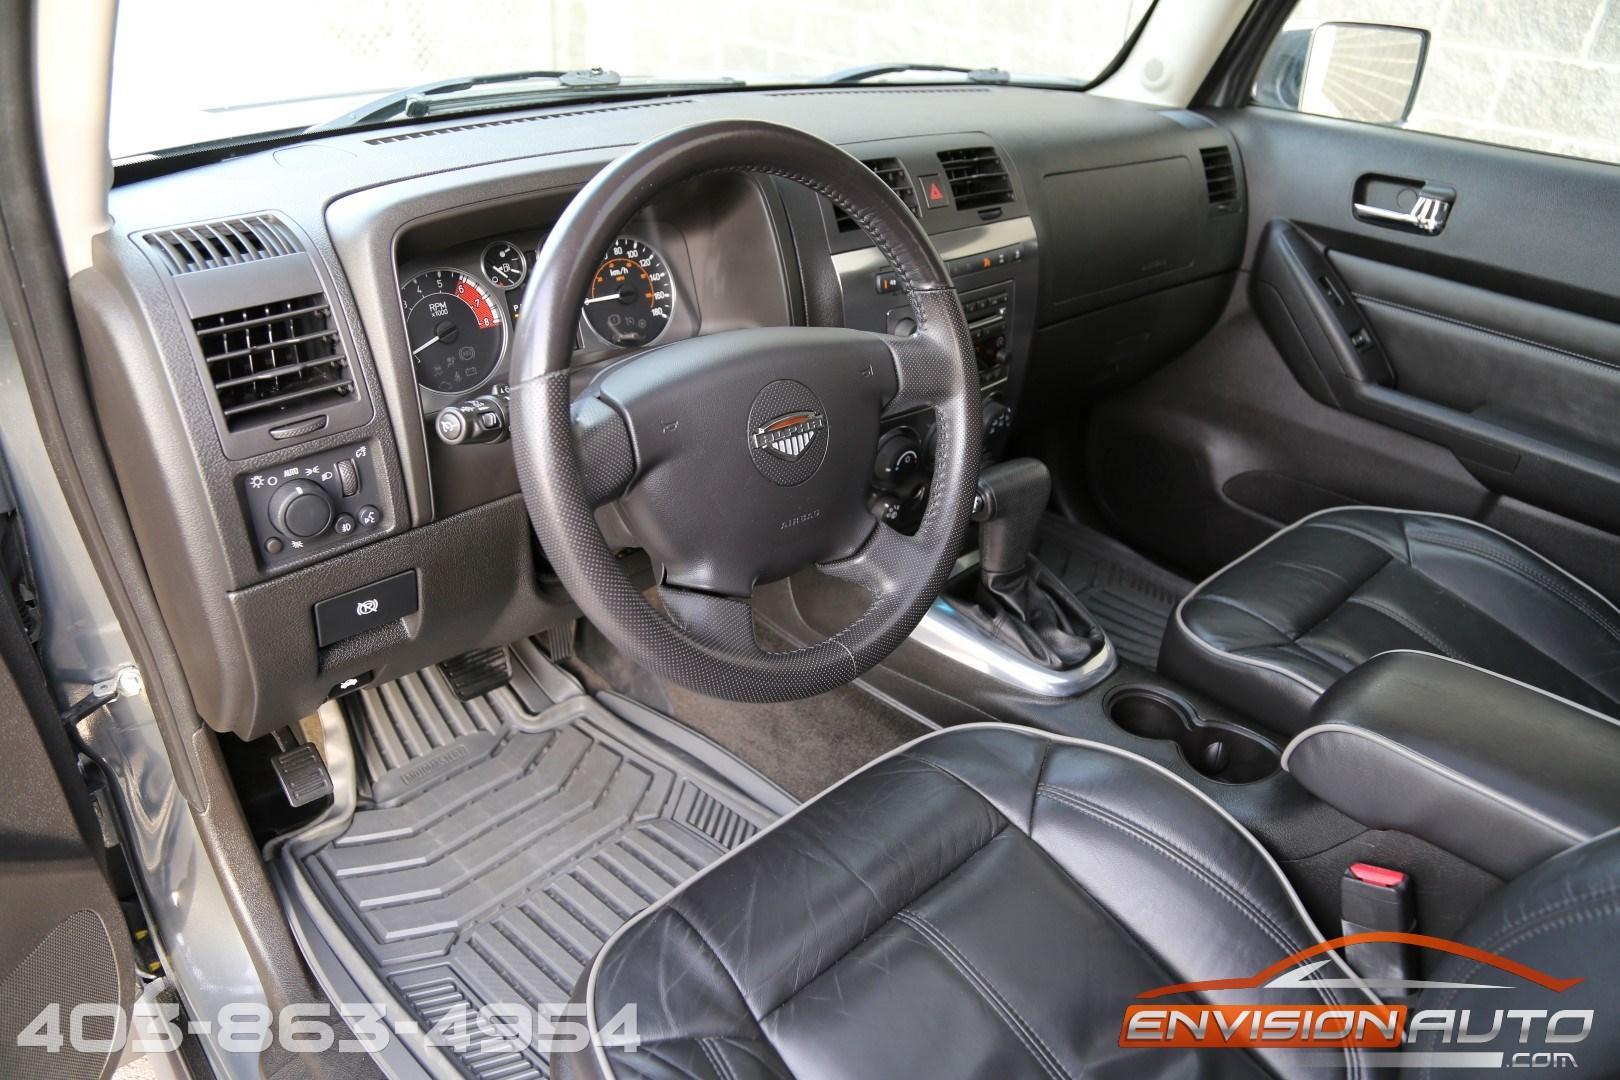 2008 H3 Hummer Suv Alpha W Offroad Amp Luxury Pkg